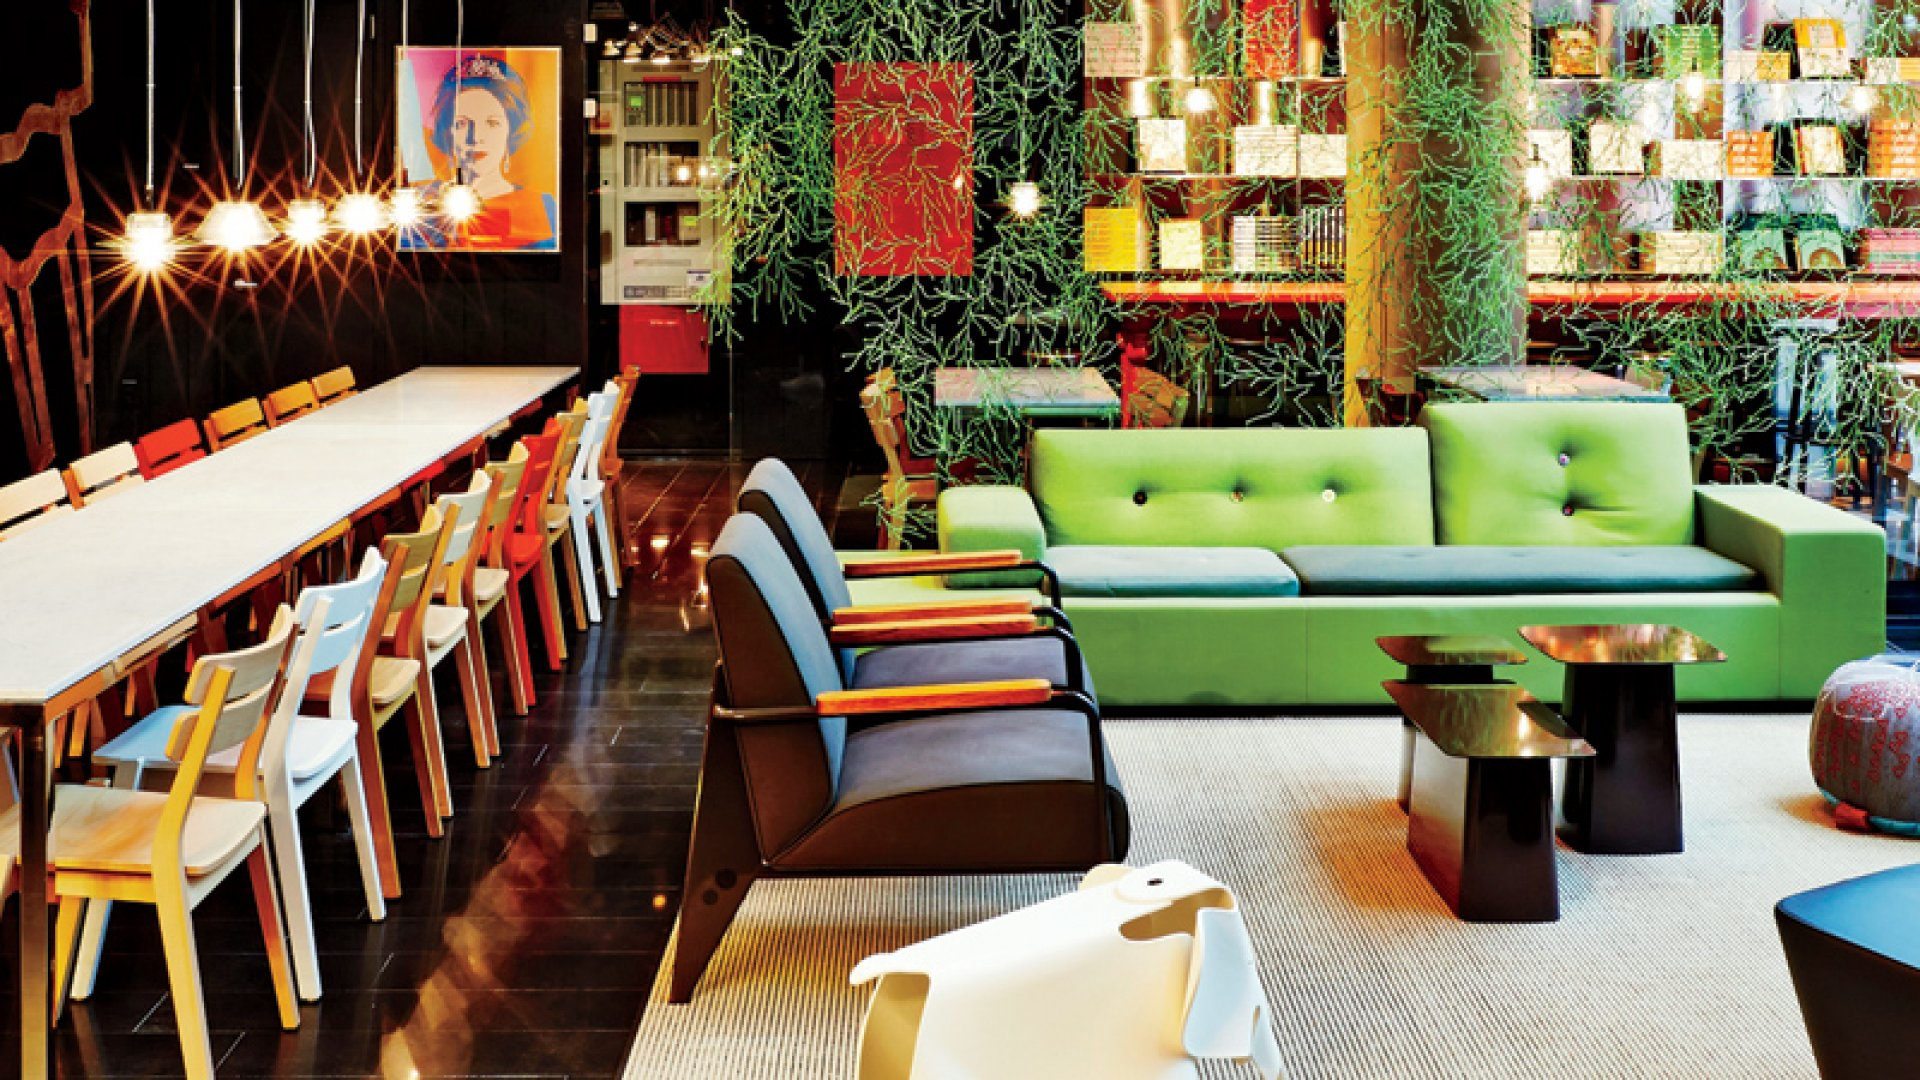 Entrepreneur Designs Upscale Hotels for Budget Travelers